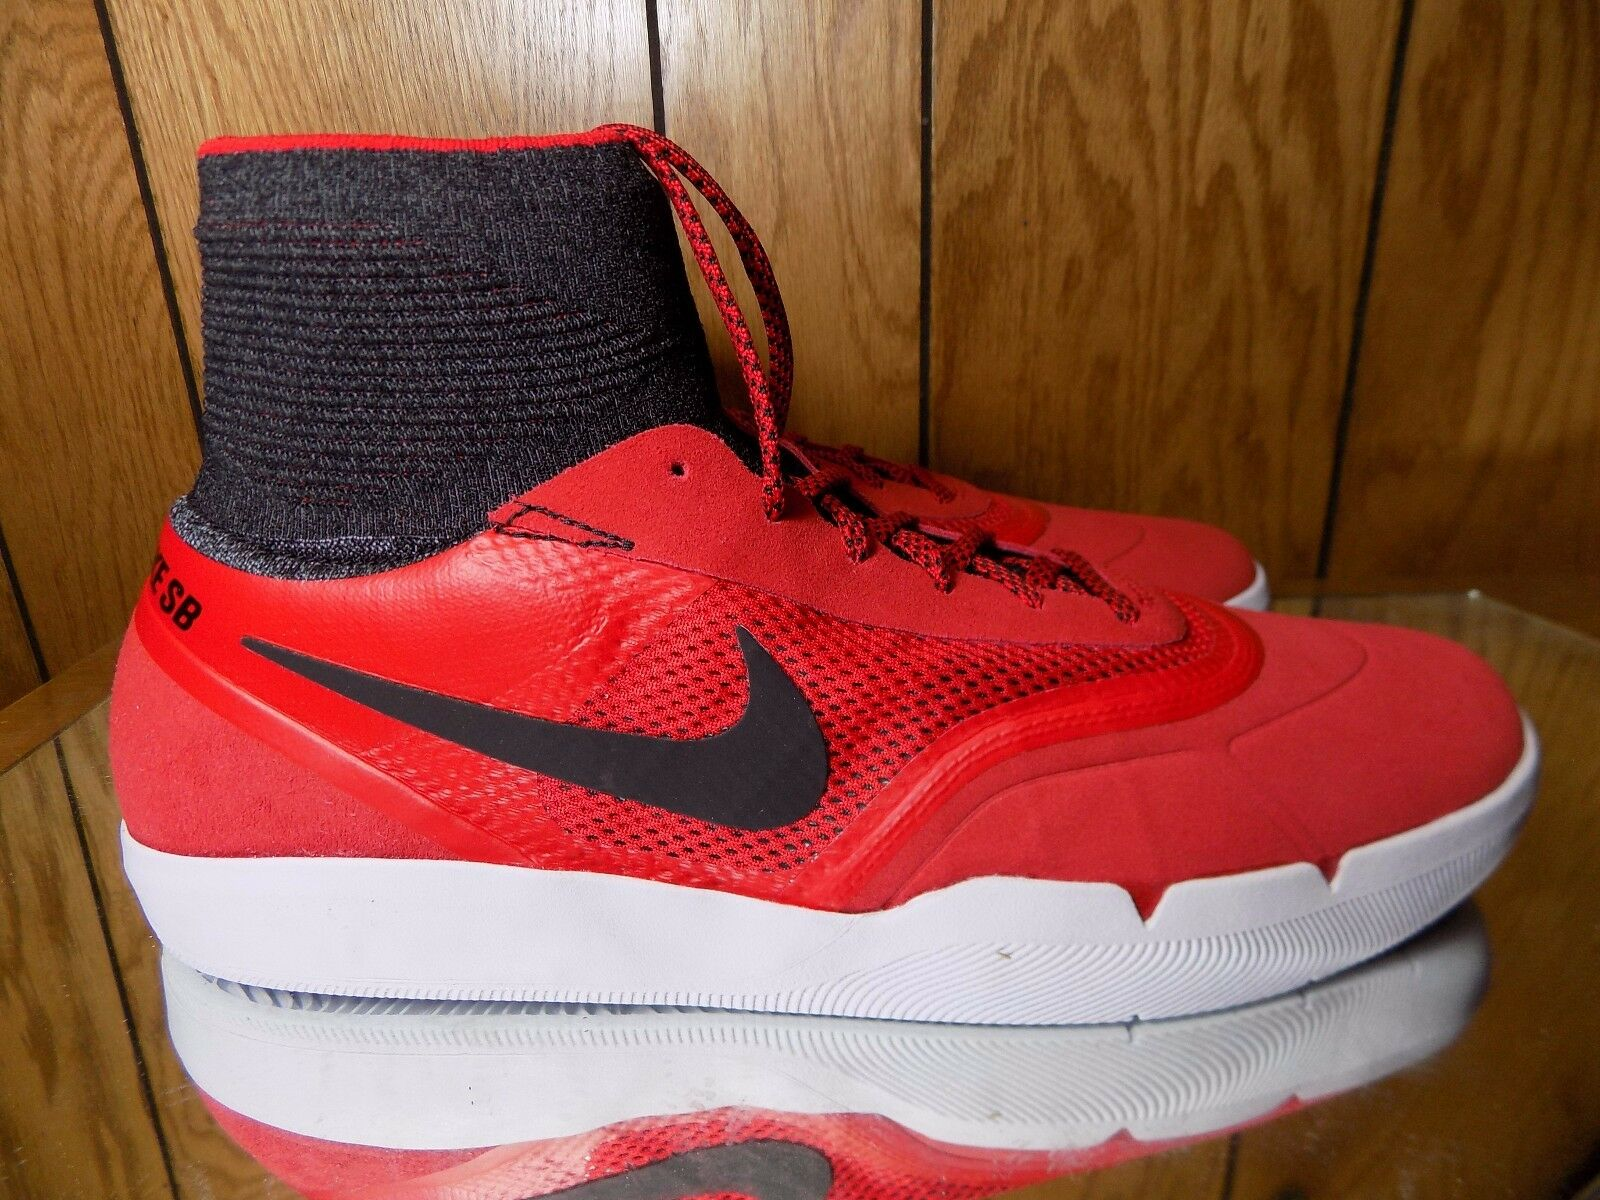 Nike sb - hyperfeel koston 3 rosso - sb nero Uomo skateboard scarpe 819673-601 sz 12 62c35f